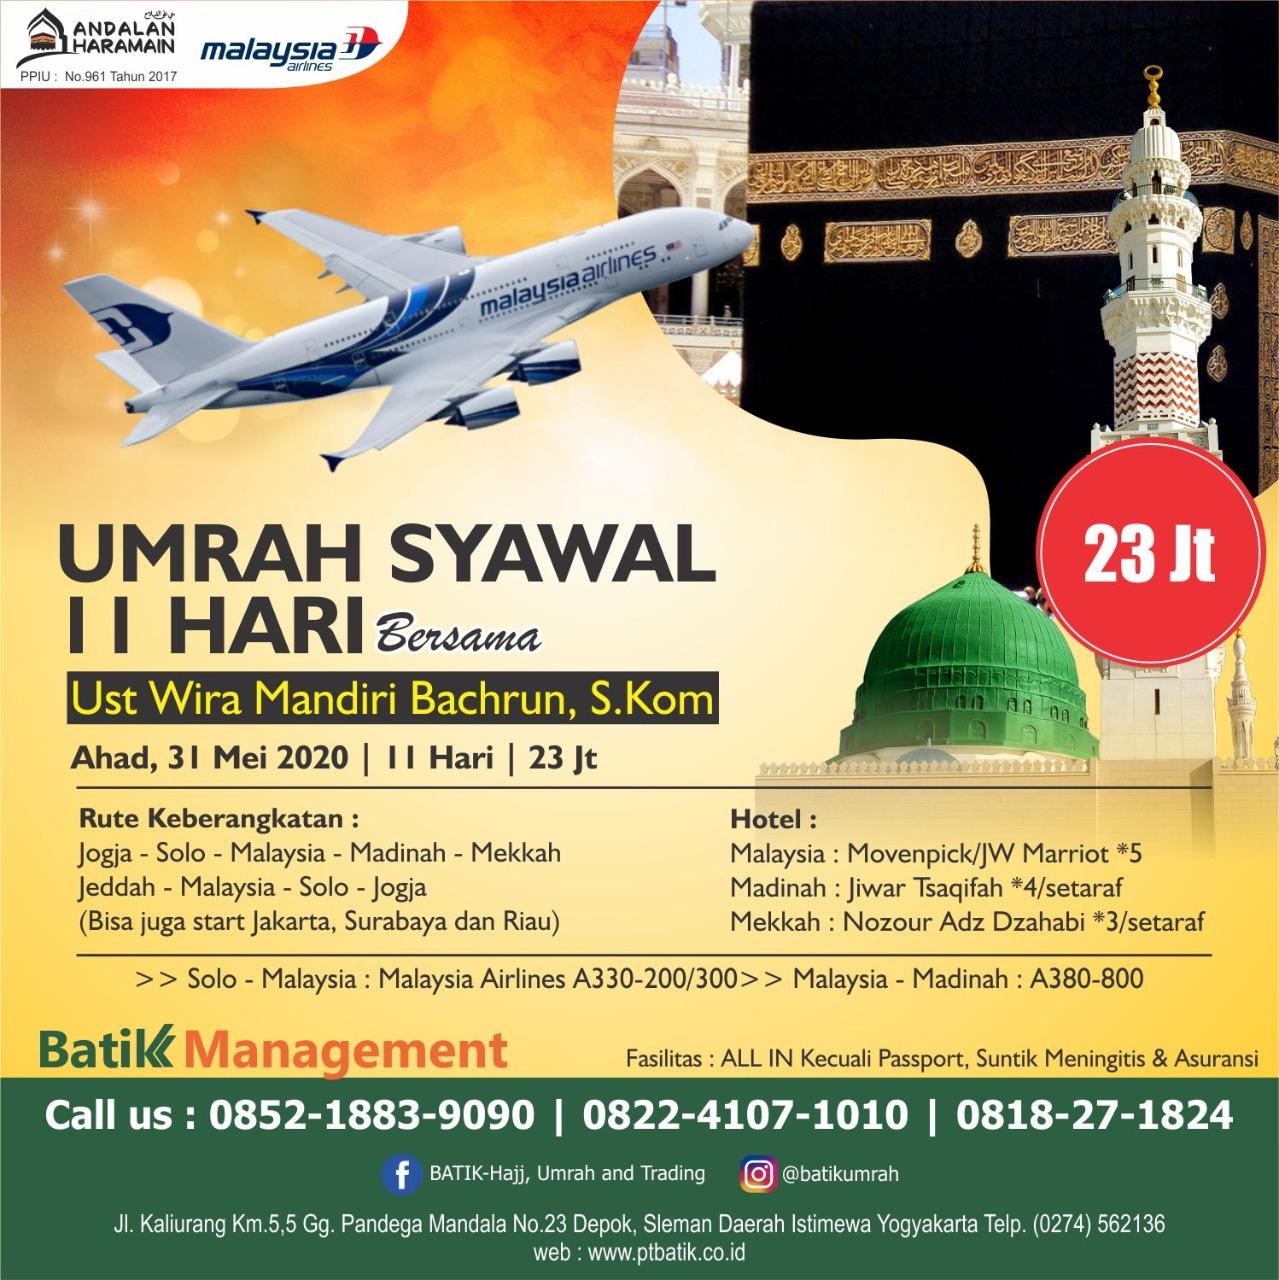 Umroh Syawal 11 Hari - 31 Mei 2020